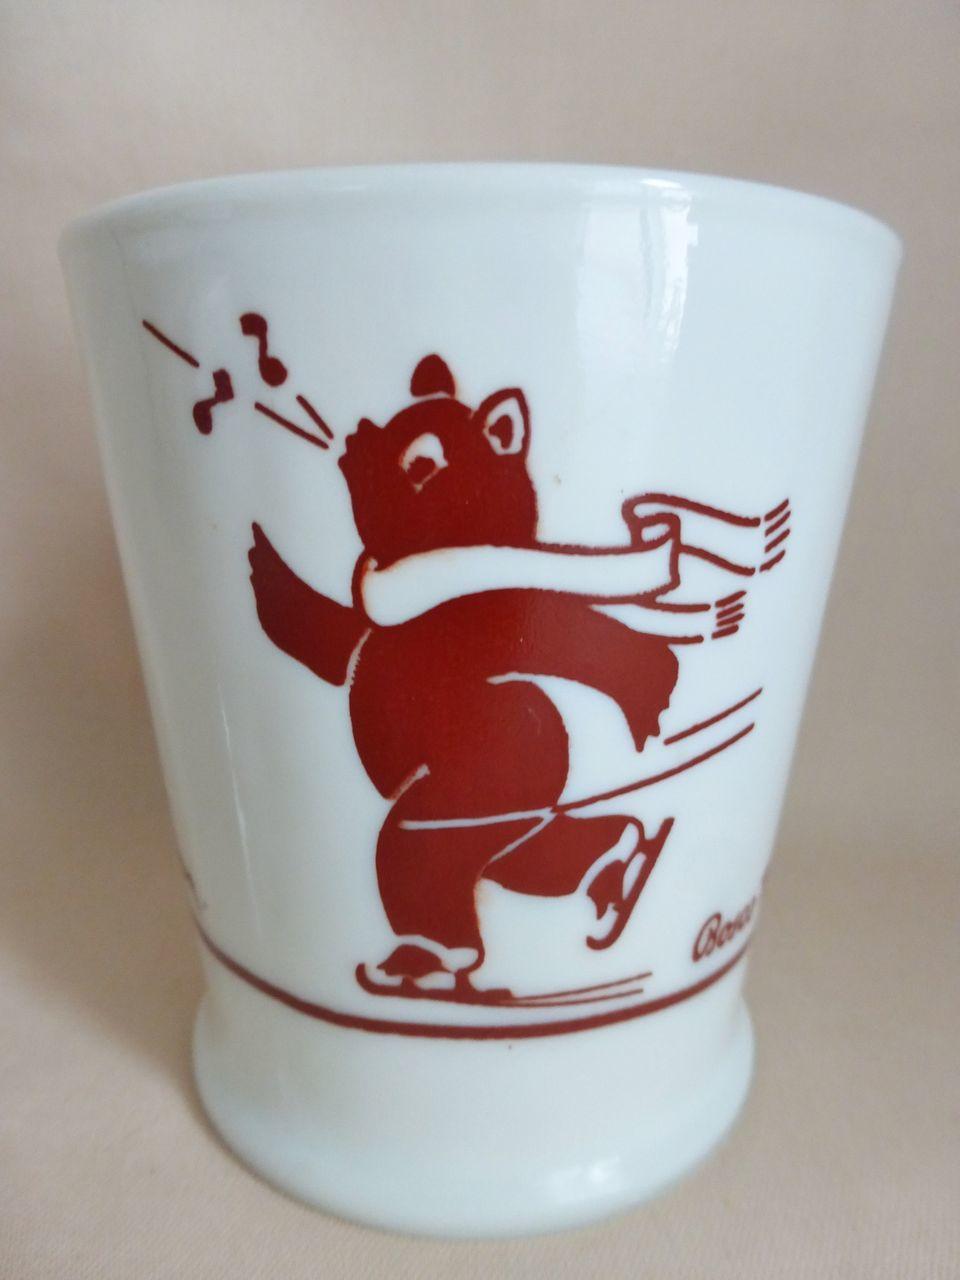 Bosco Skating Bear Mug by Fire King from seasonspast on Ruby Lane